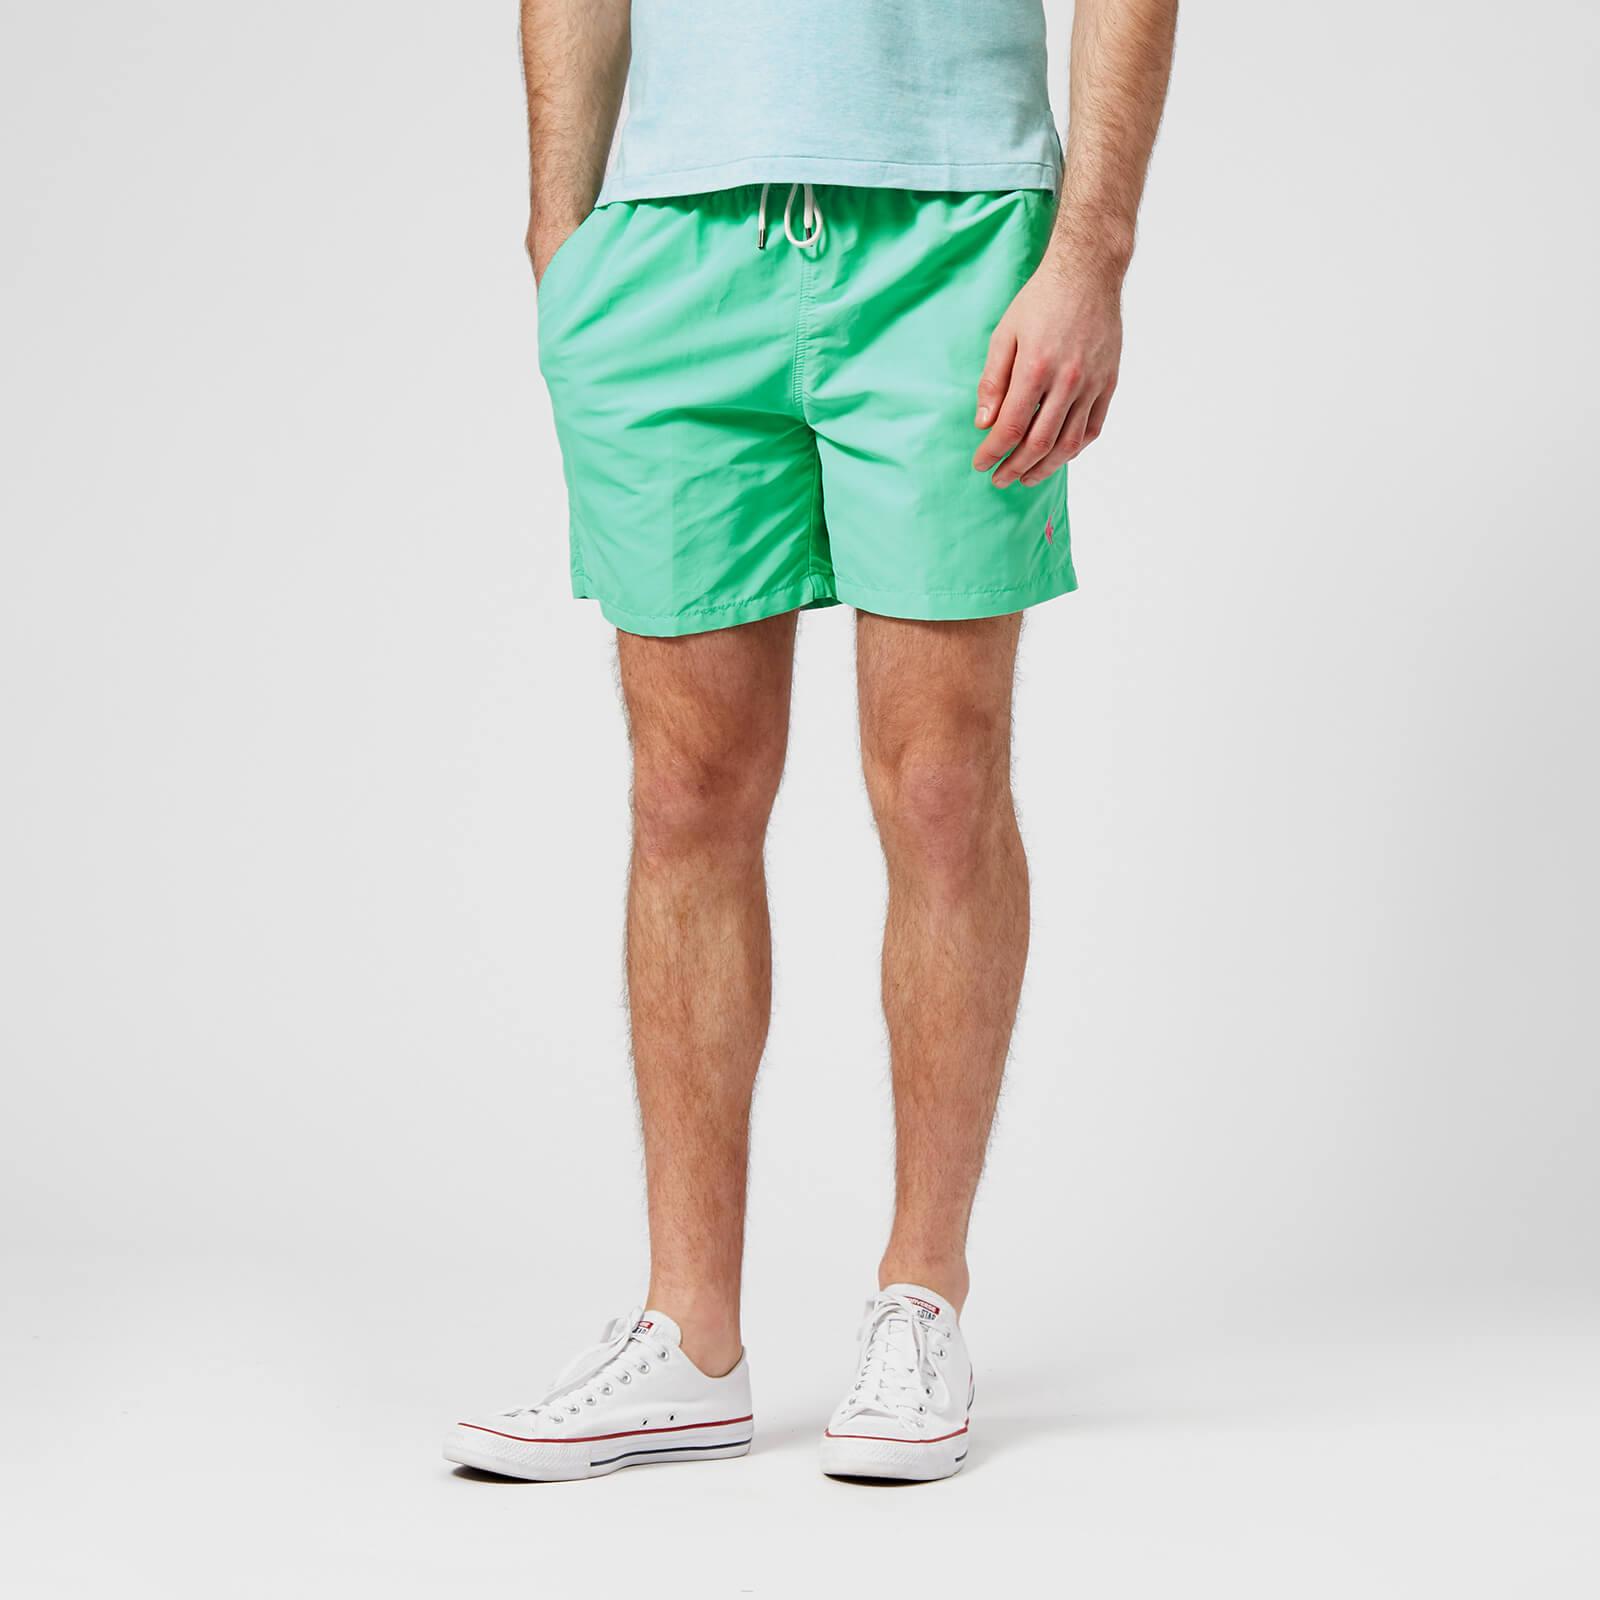 0f24b57e62 Polo Ralph Lauren Men's Traveler Swim Shorts - Hawaiian Green - Free UK  Delivery over £50